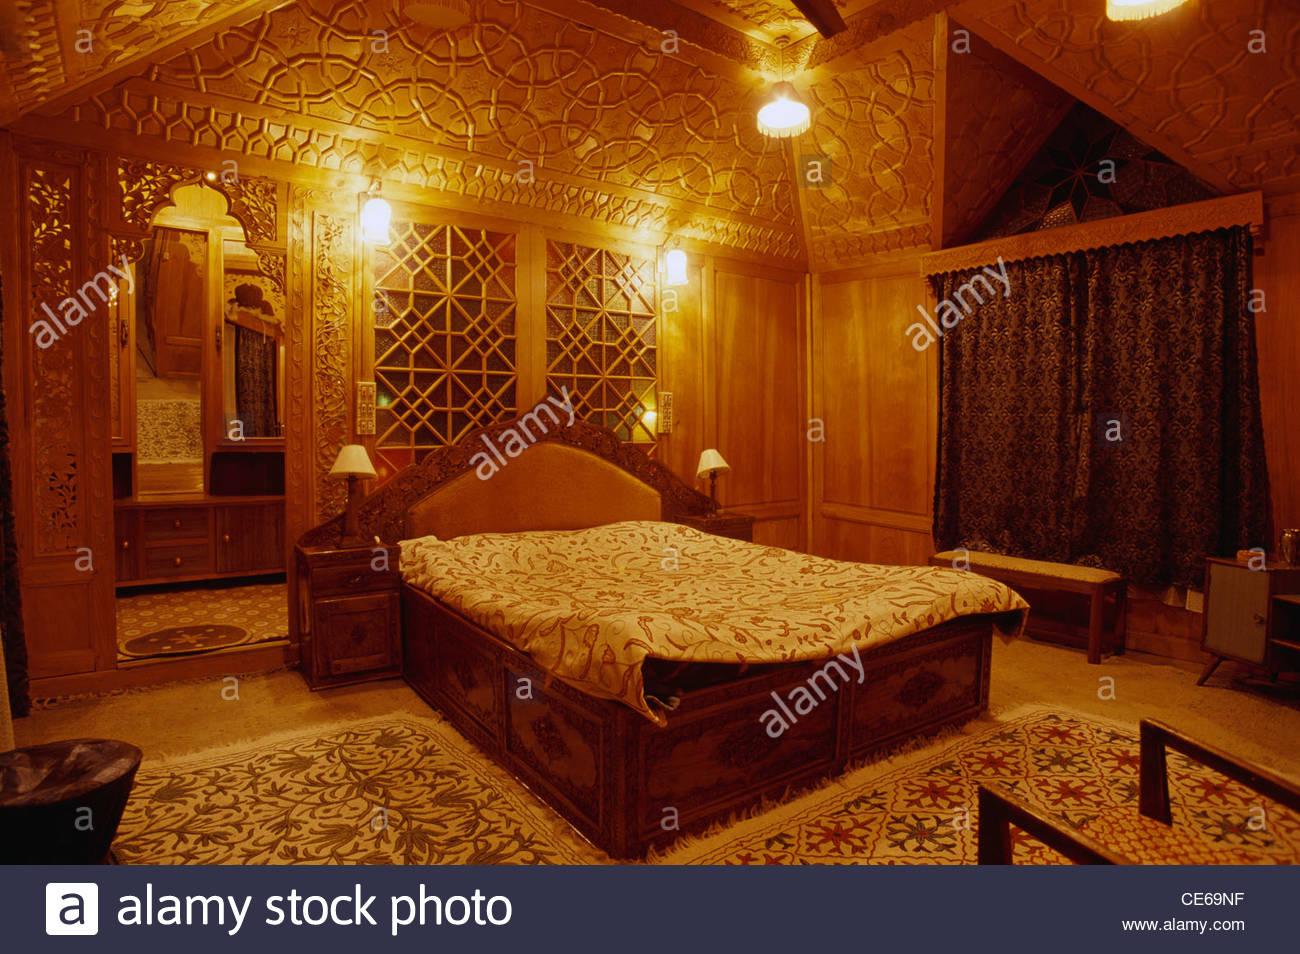 Bedroom Inside House Boat Dal Lake Srinagar Jammu